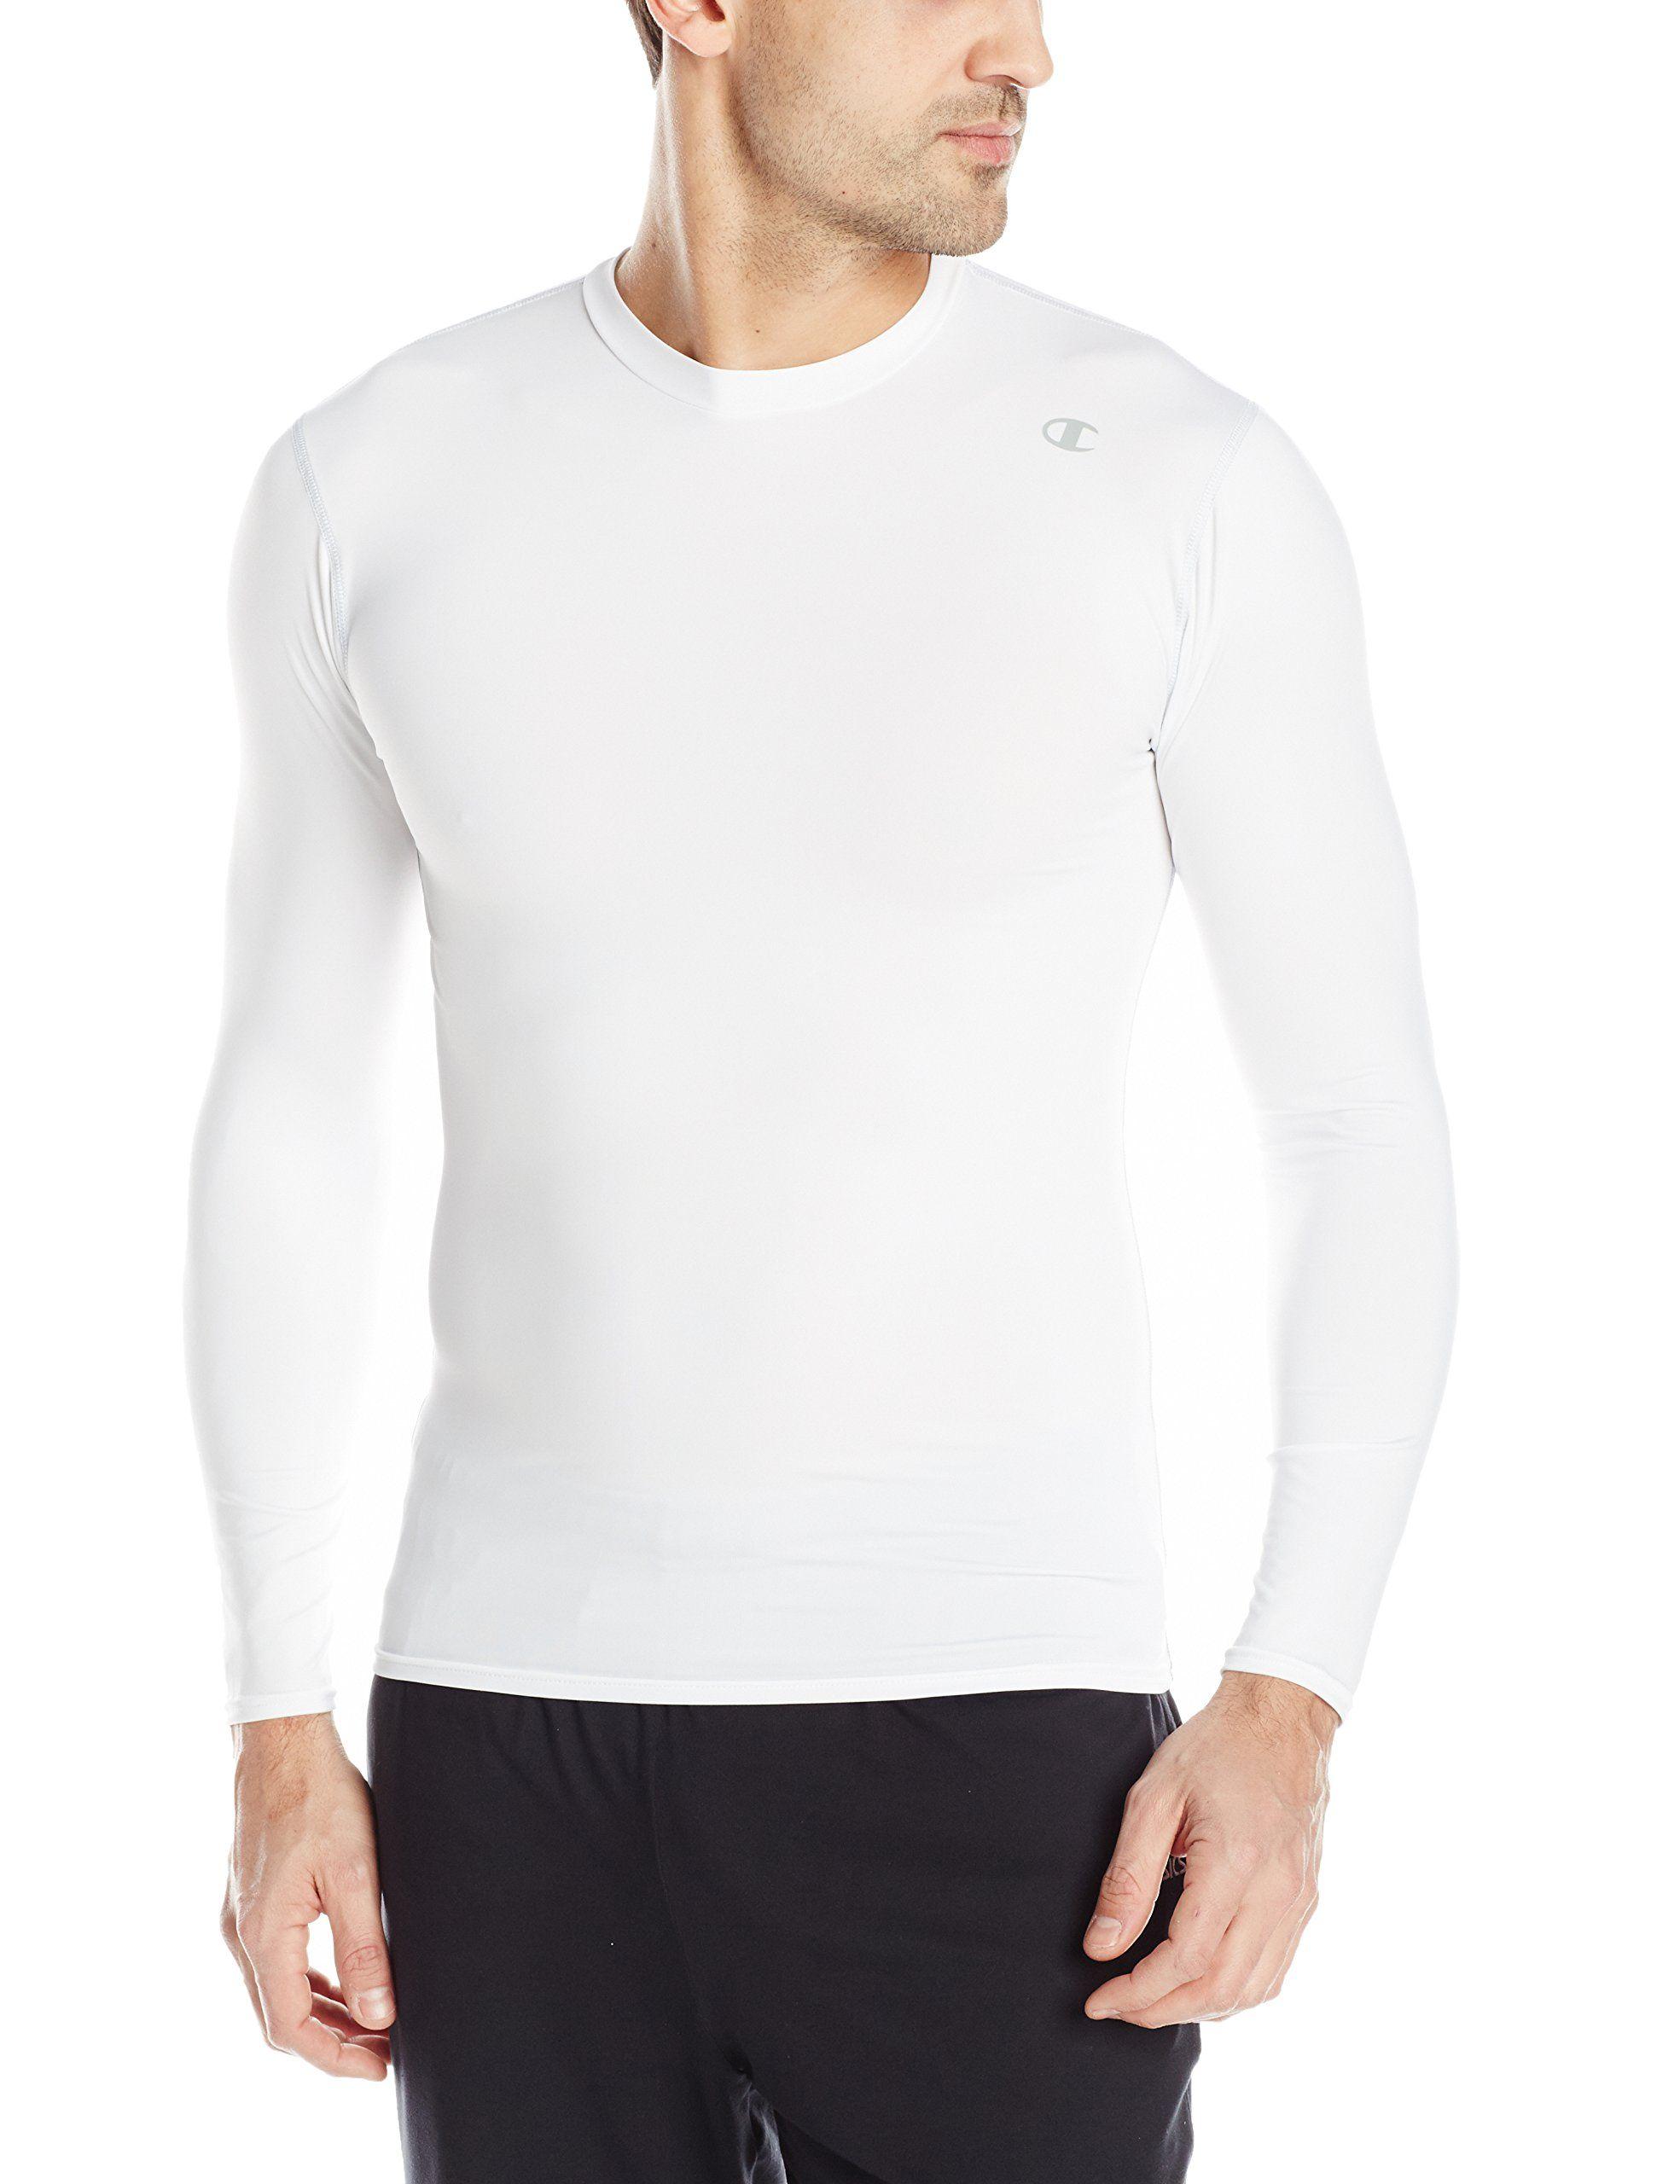 c97c51849a702b Champion Men s Double Dry Long Sleeve Compression Shirt